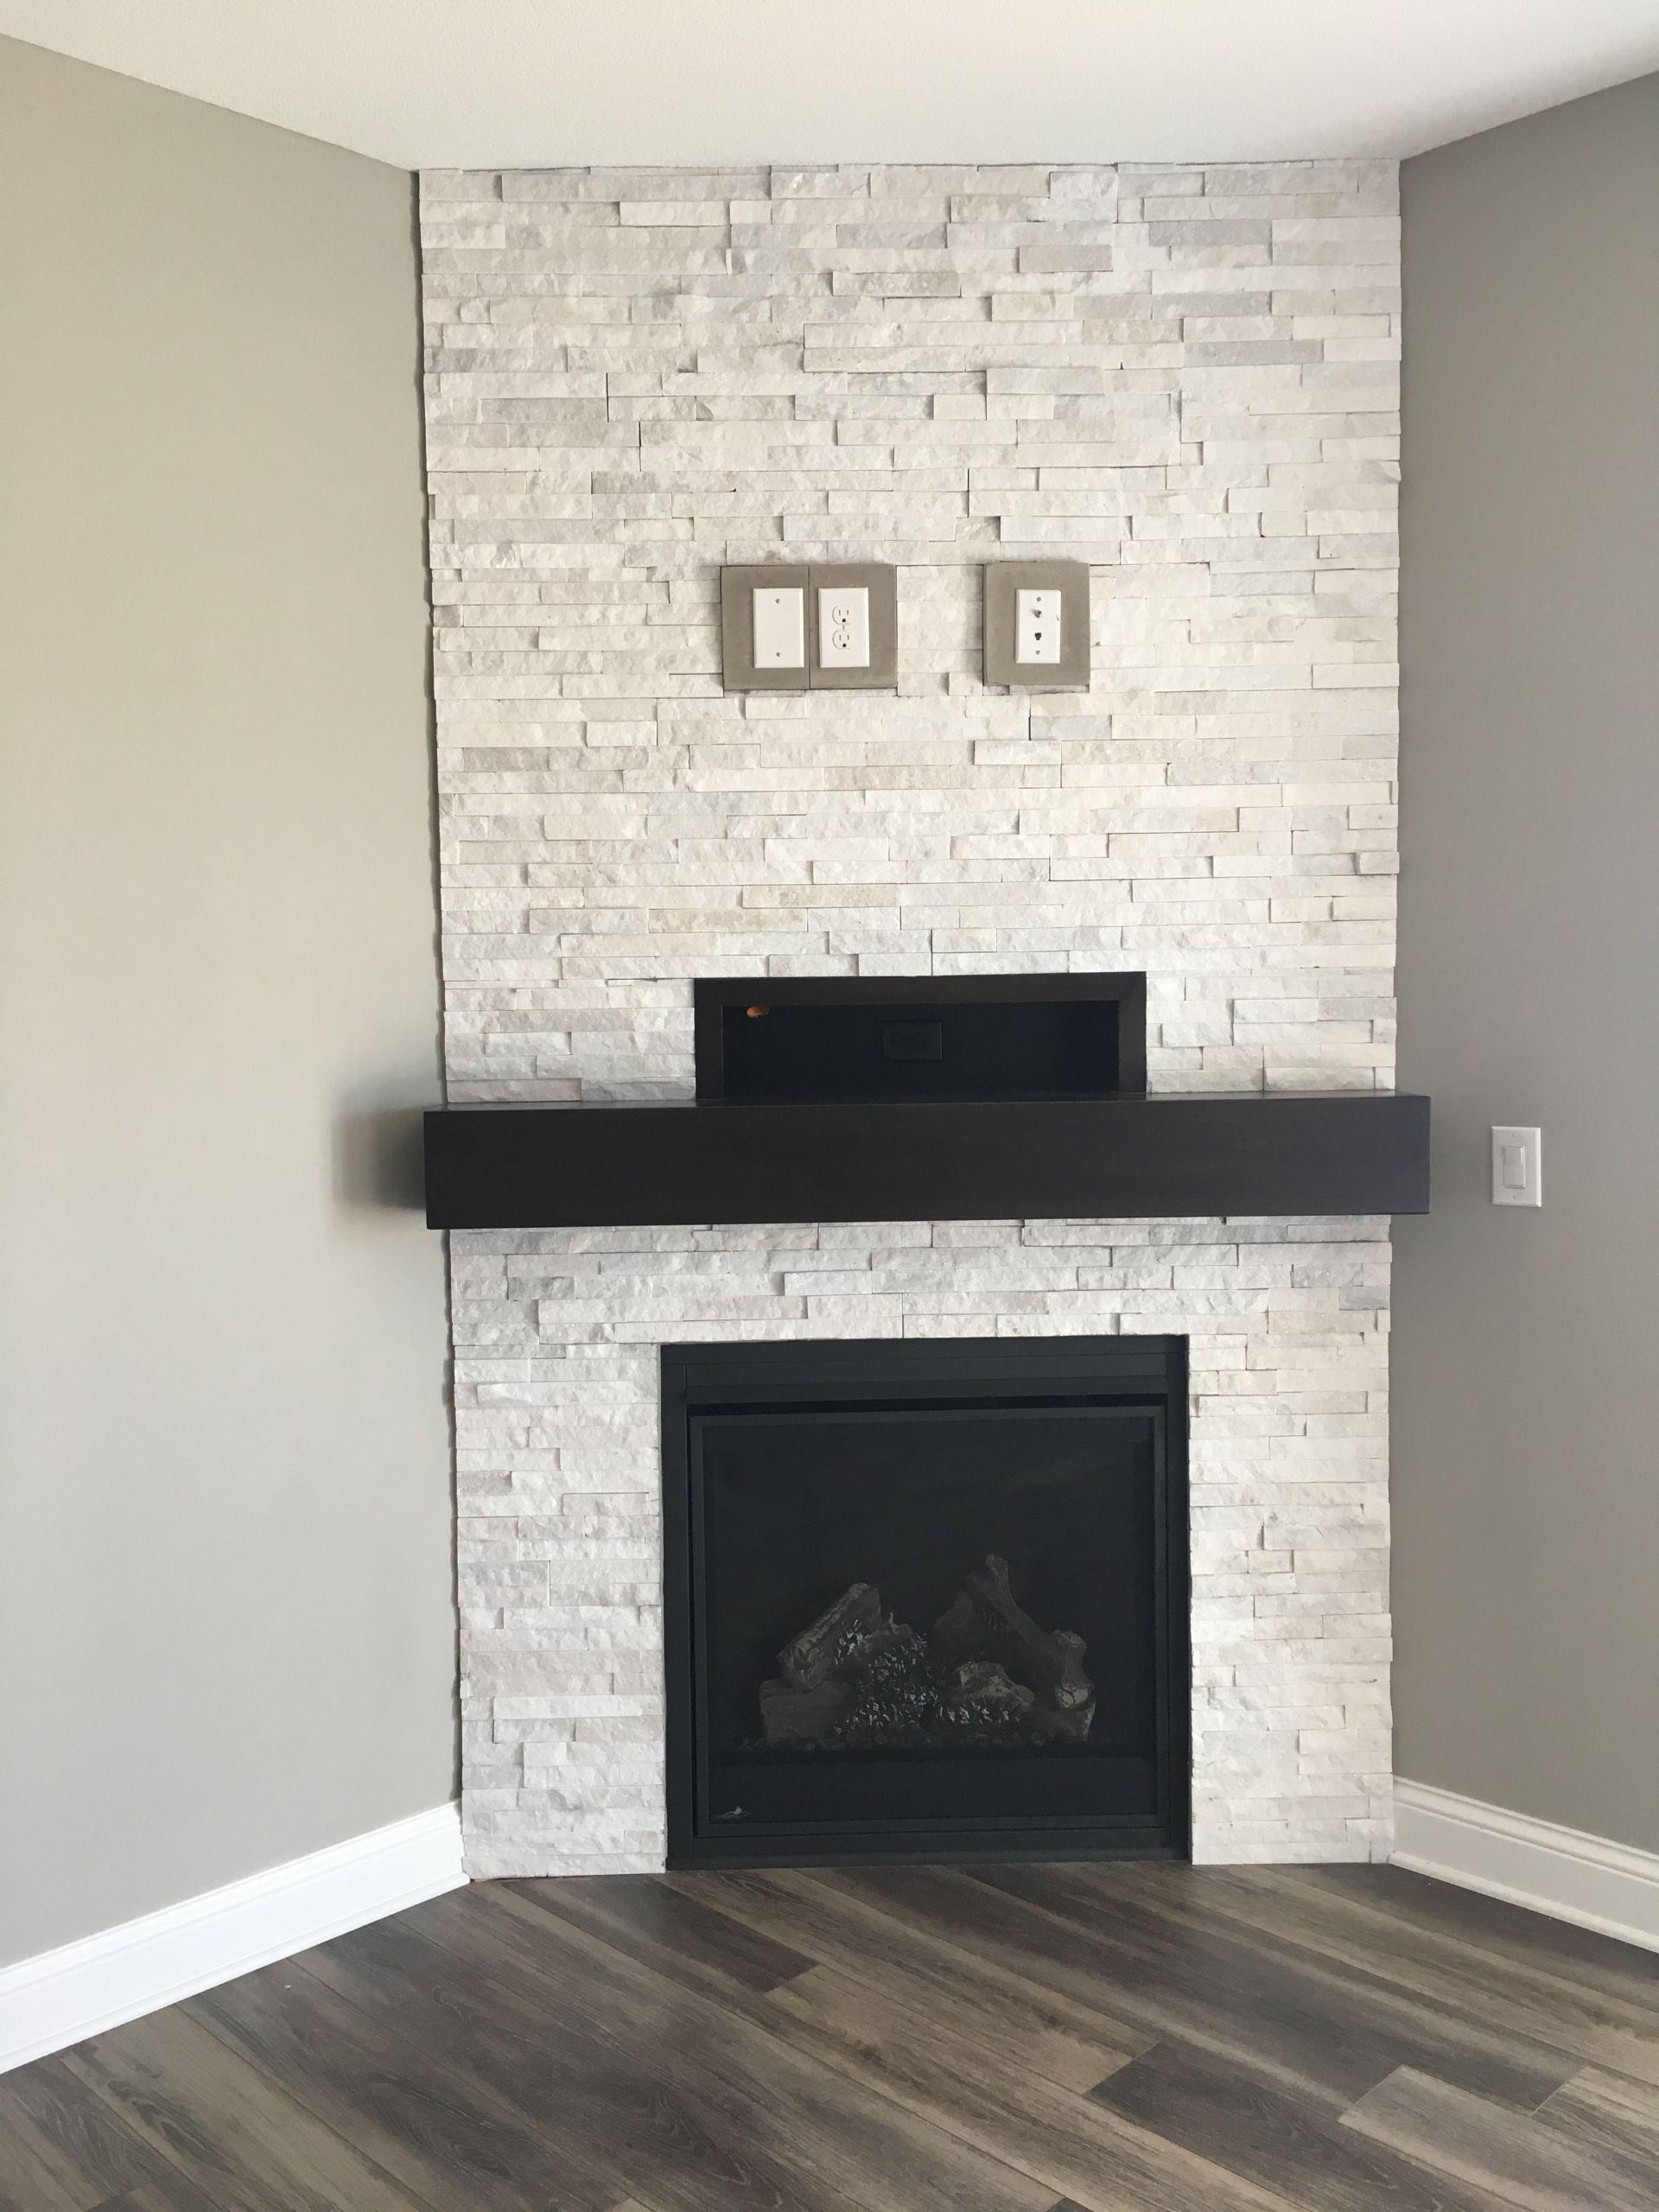 Stone Fireplace with Wood Mantel Beautiful Pin On Fireplace Ideas We Love